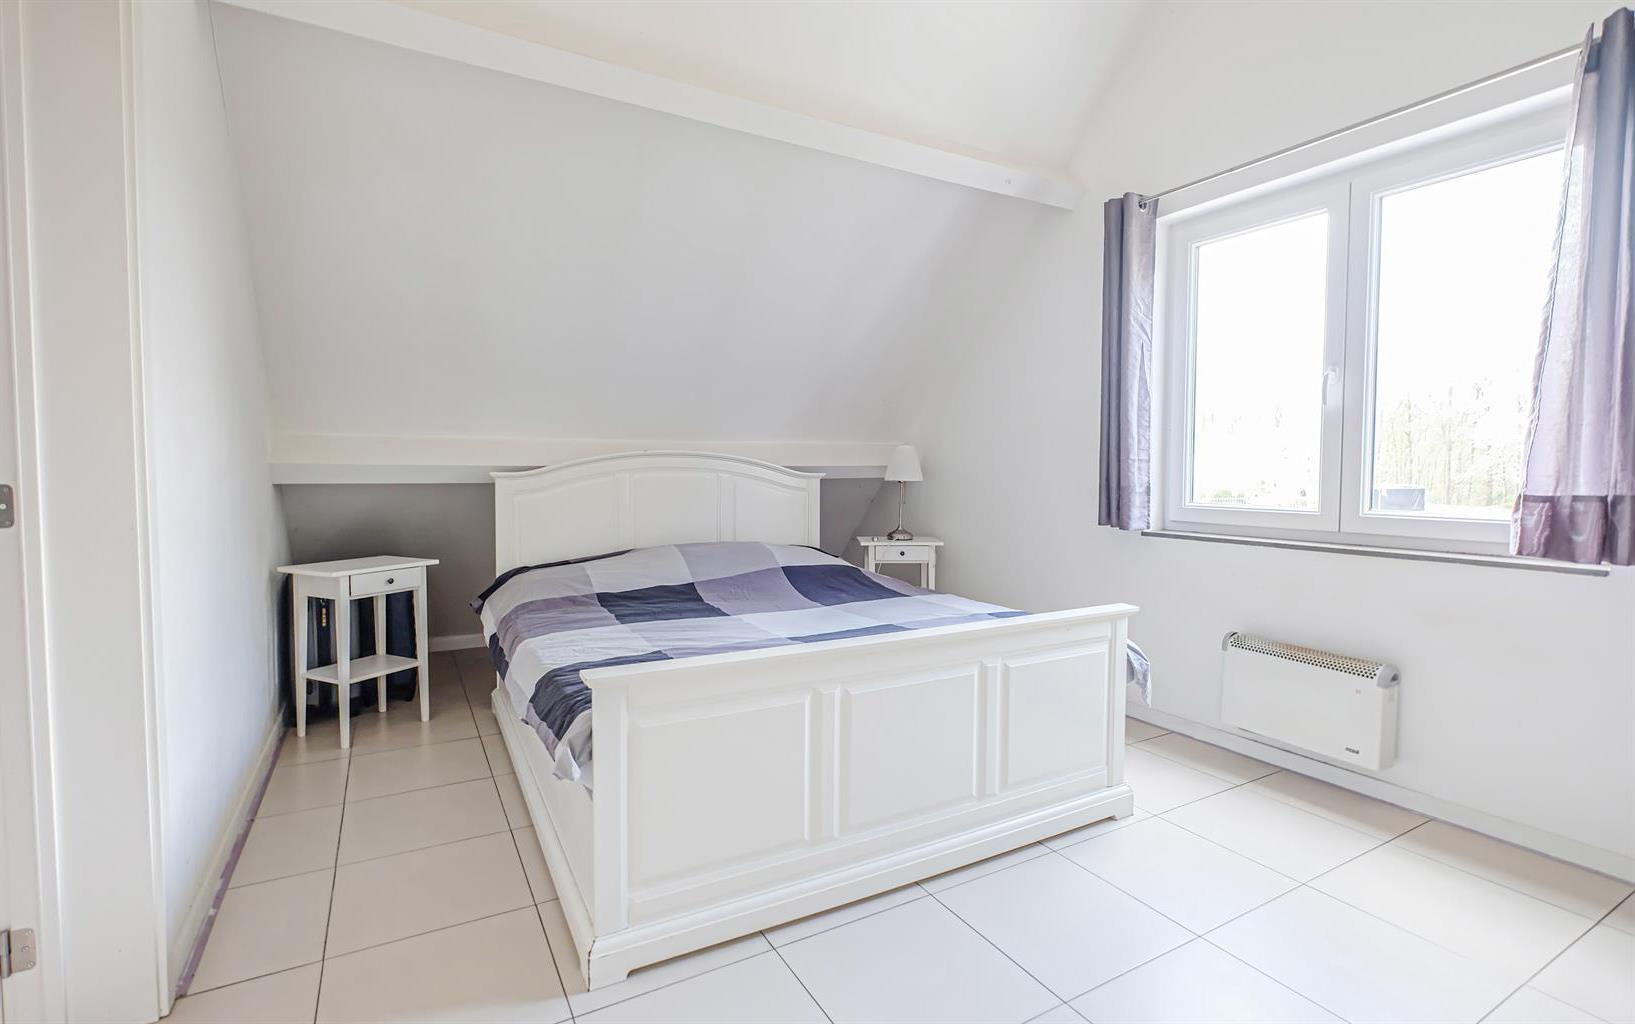 Duplex - Braine-le-Comte - #4384185-5